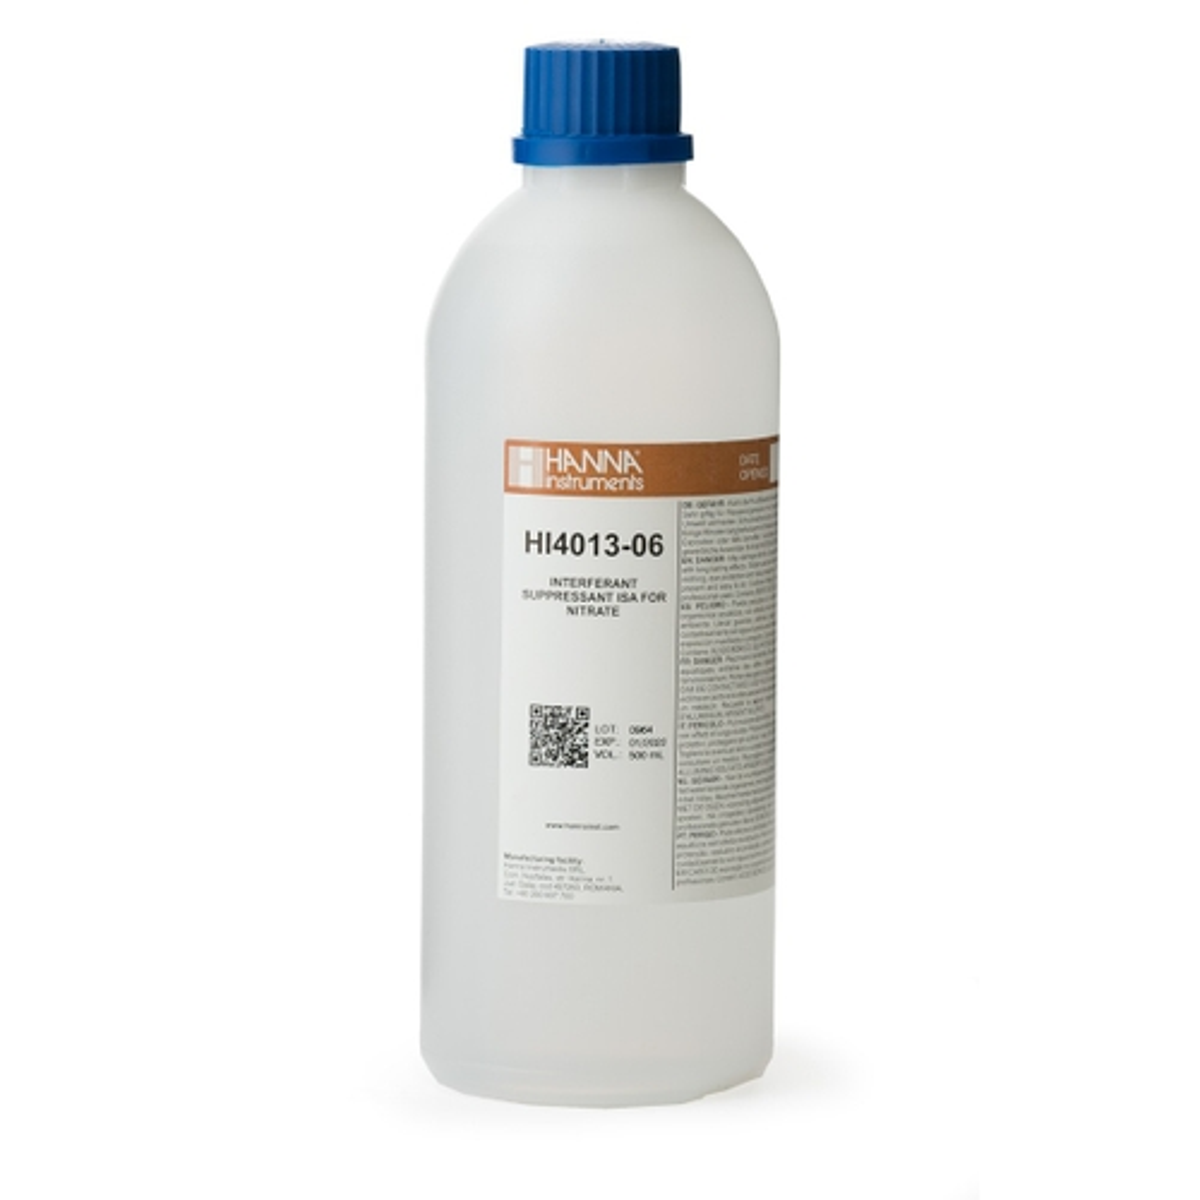 Interferent Suppressant ISA (ISISA) for Nitrate ISEs - HI4013-06